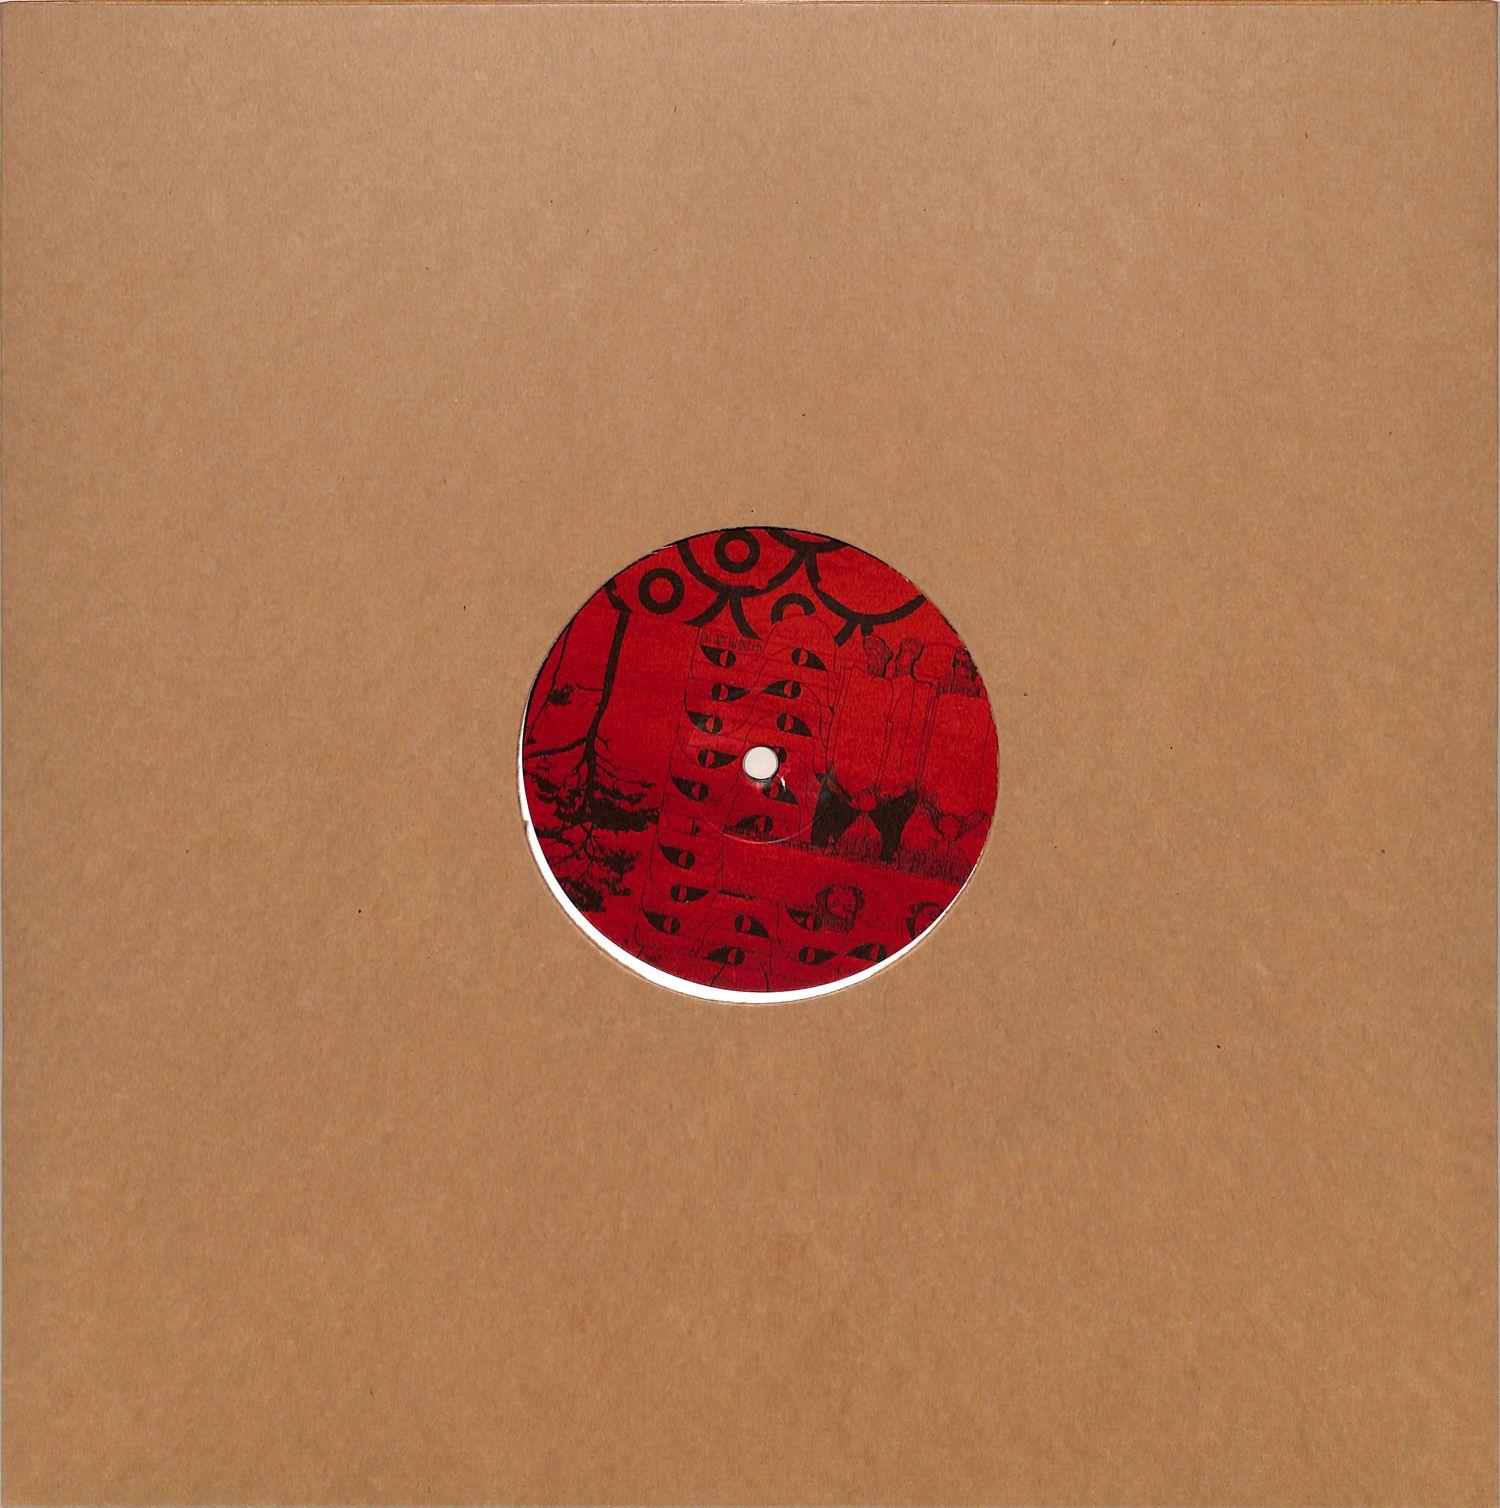 Apua & Philipp Boss - PALMENHOUZE EP